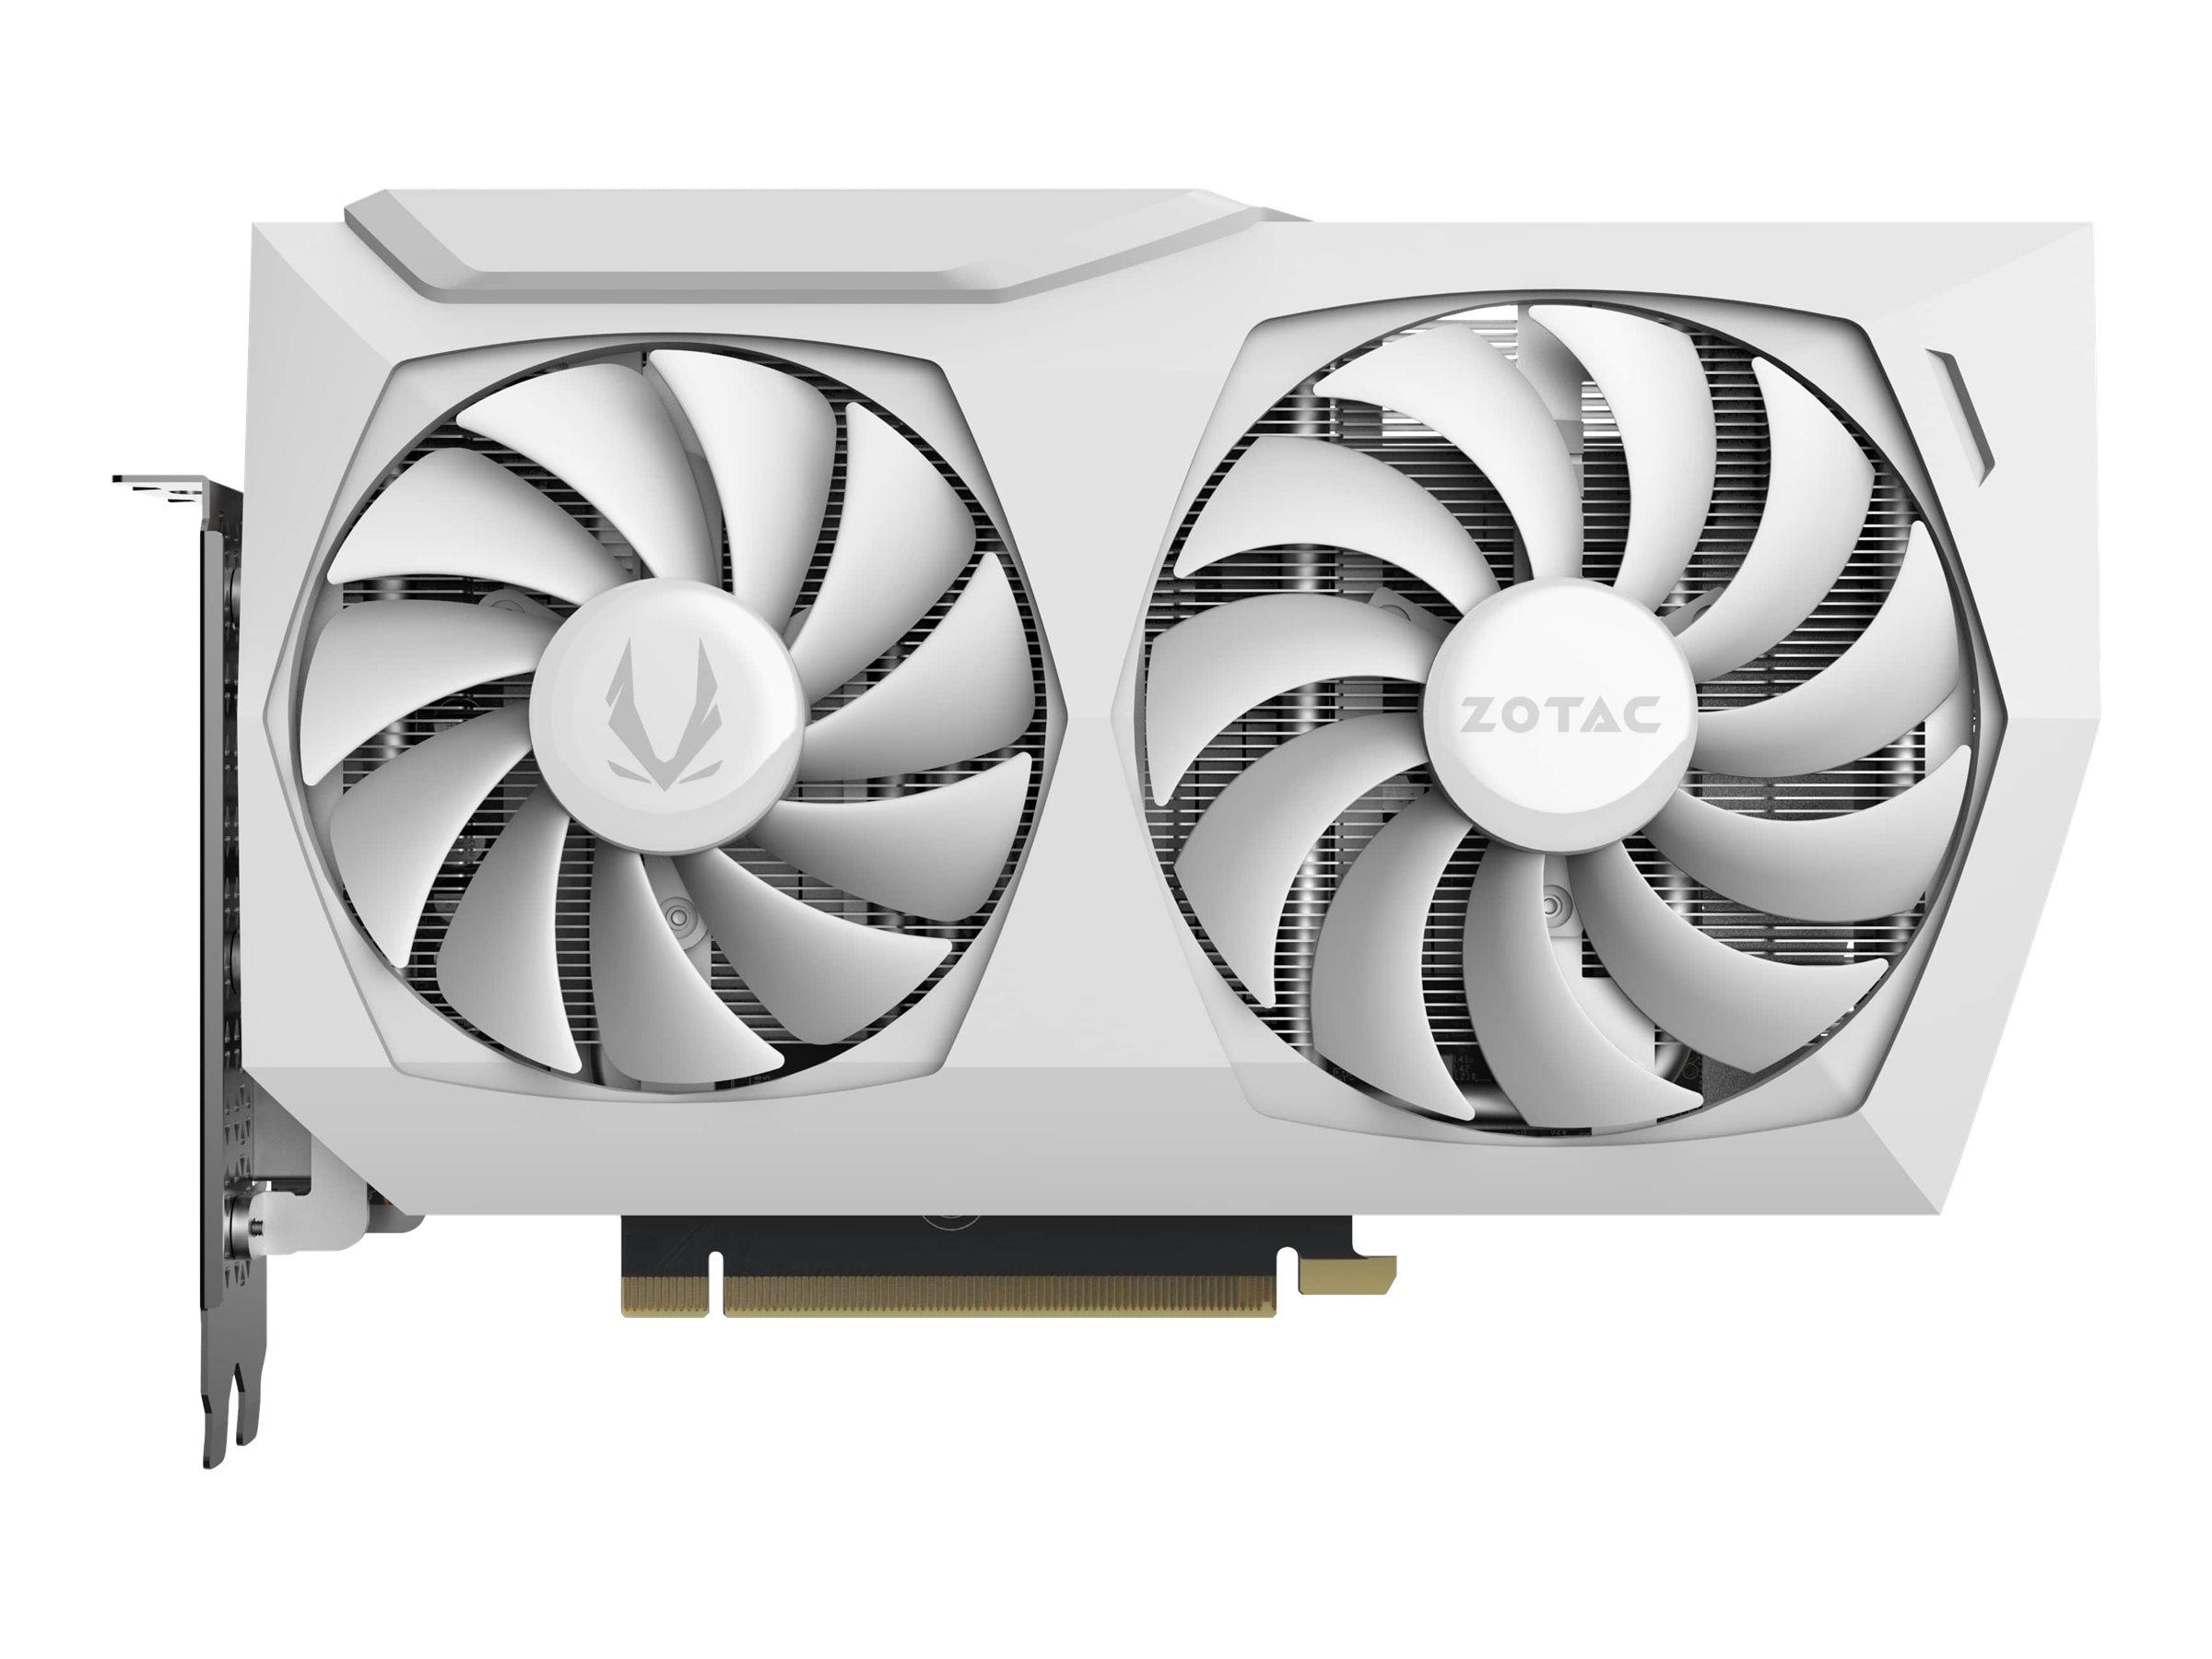 ZOTAC GAMING GeForce RTX 3070 Twin Edge OC - White Edition